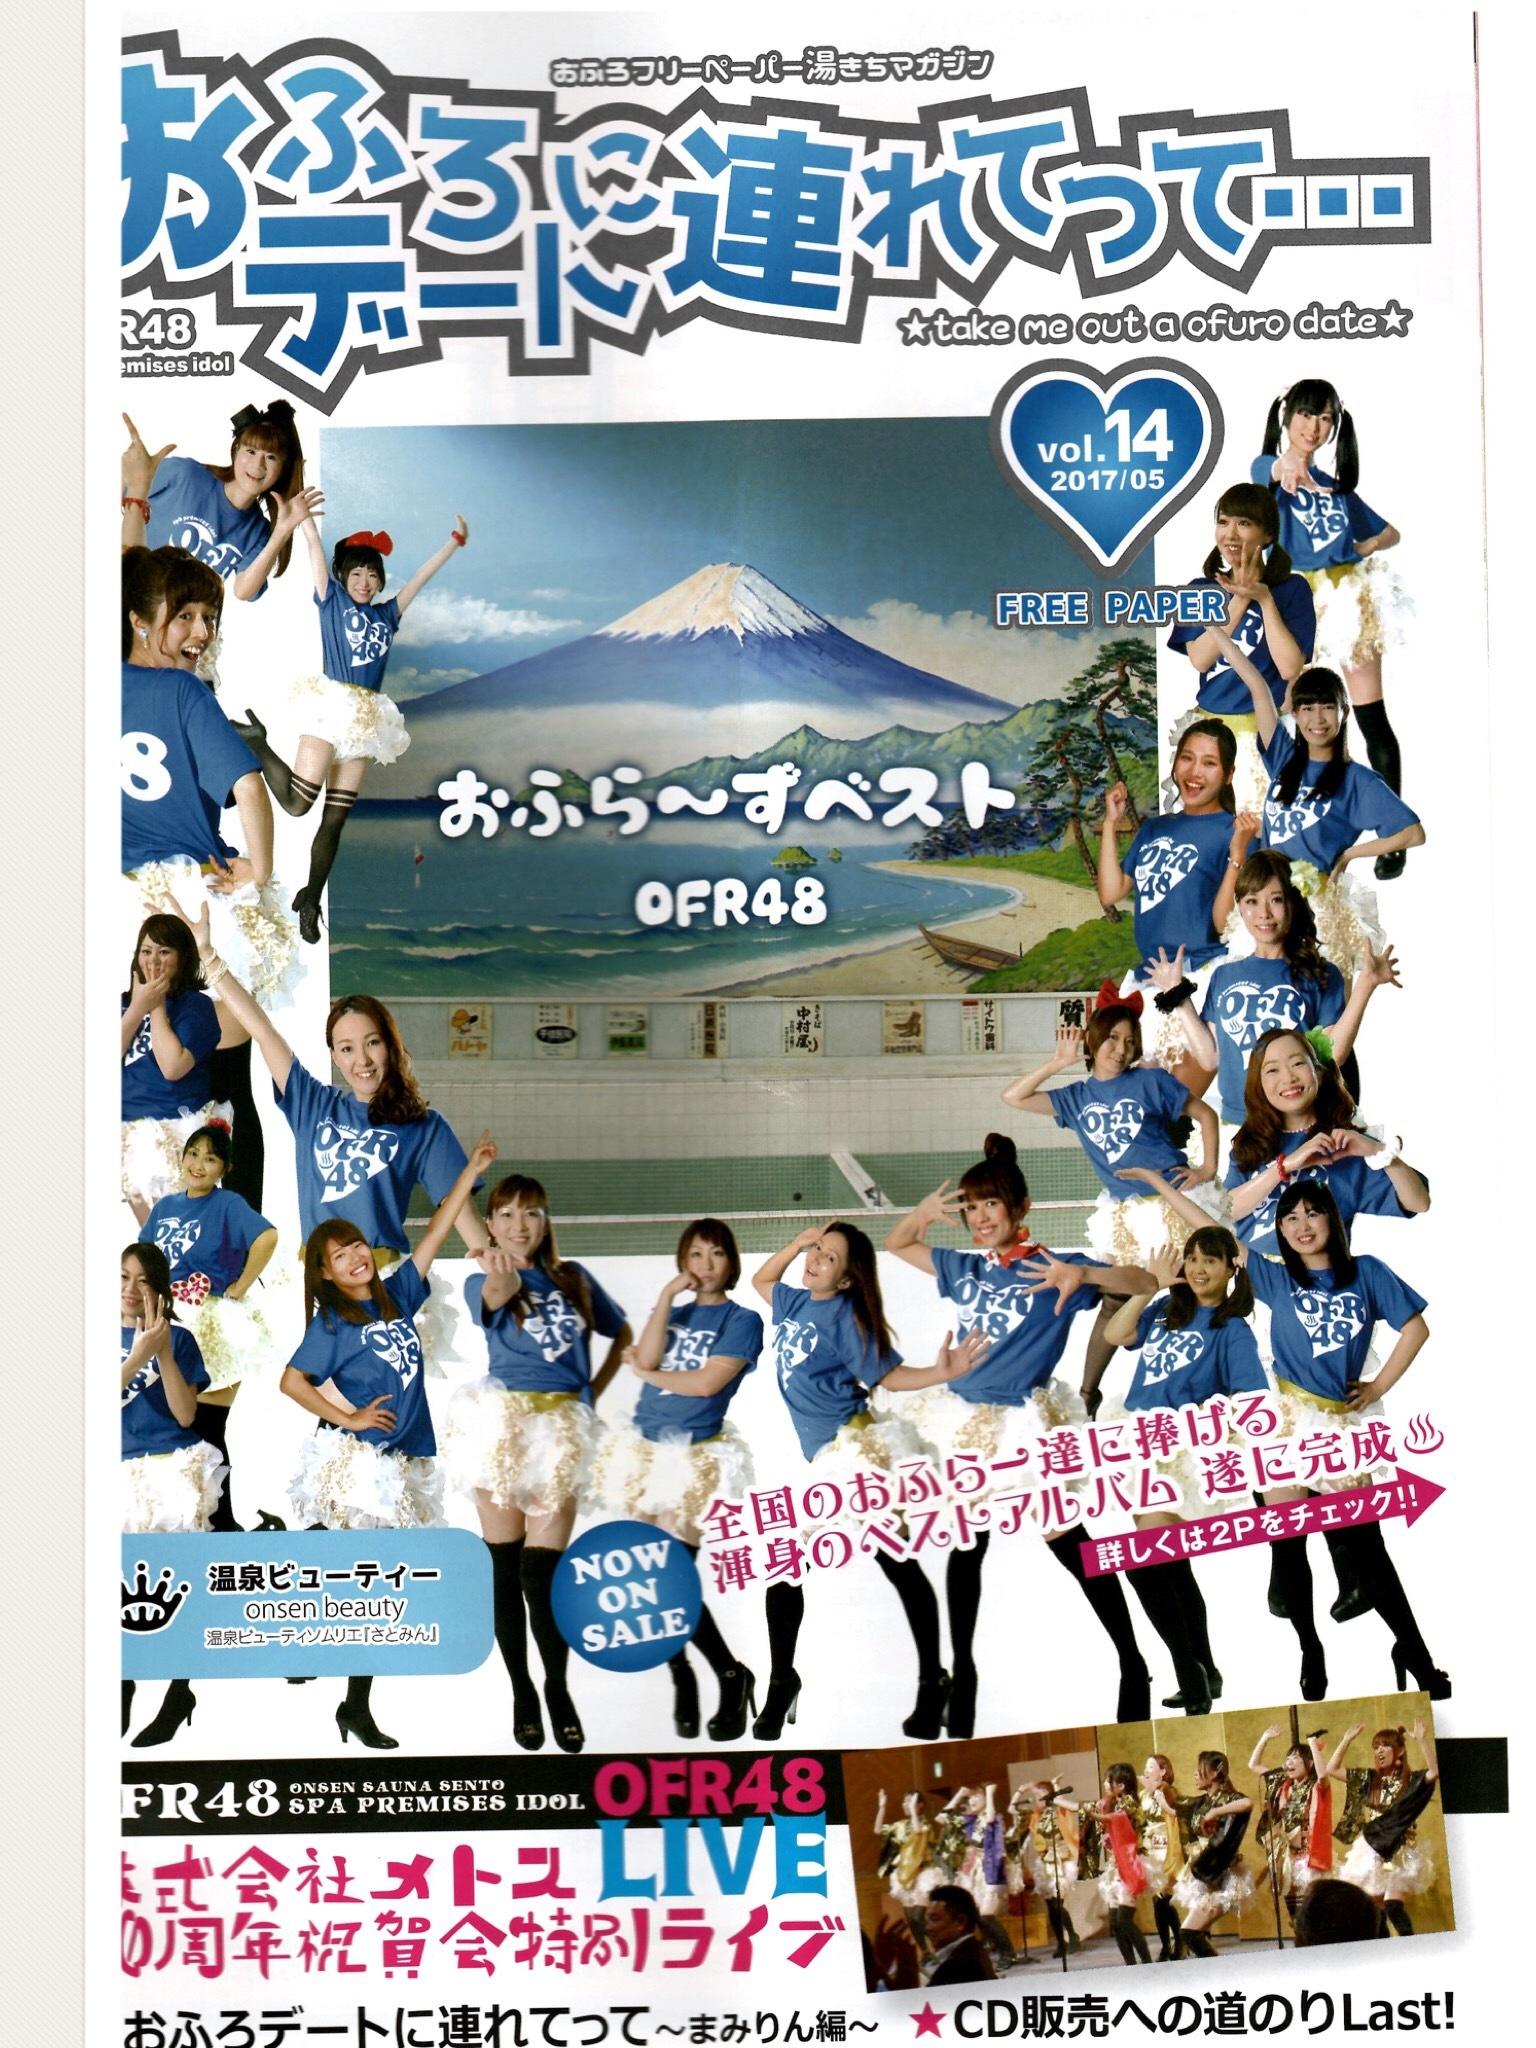 天然温泉 満天の湯 横浜保土ヶ谷 上星川 OFR48